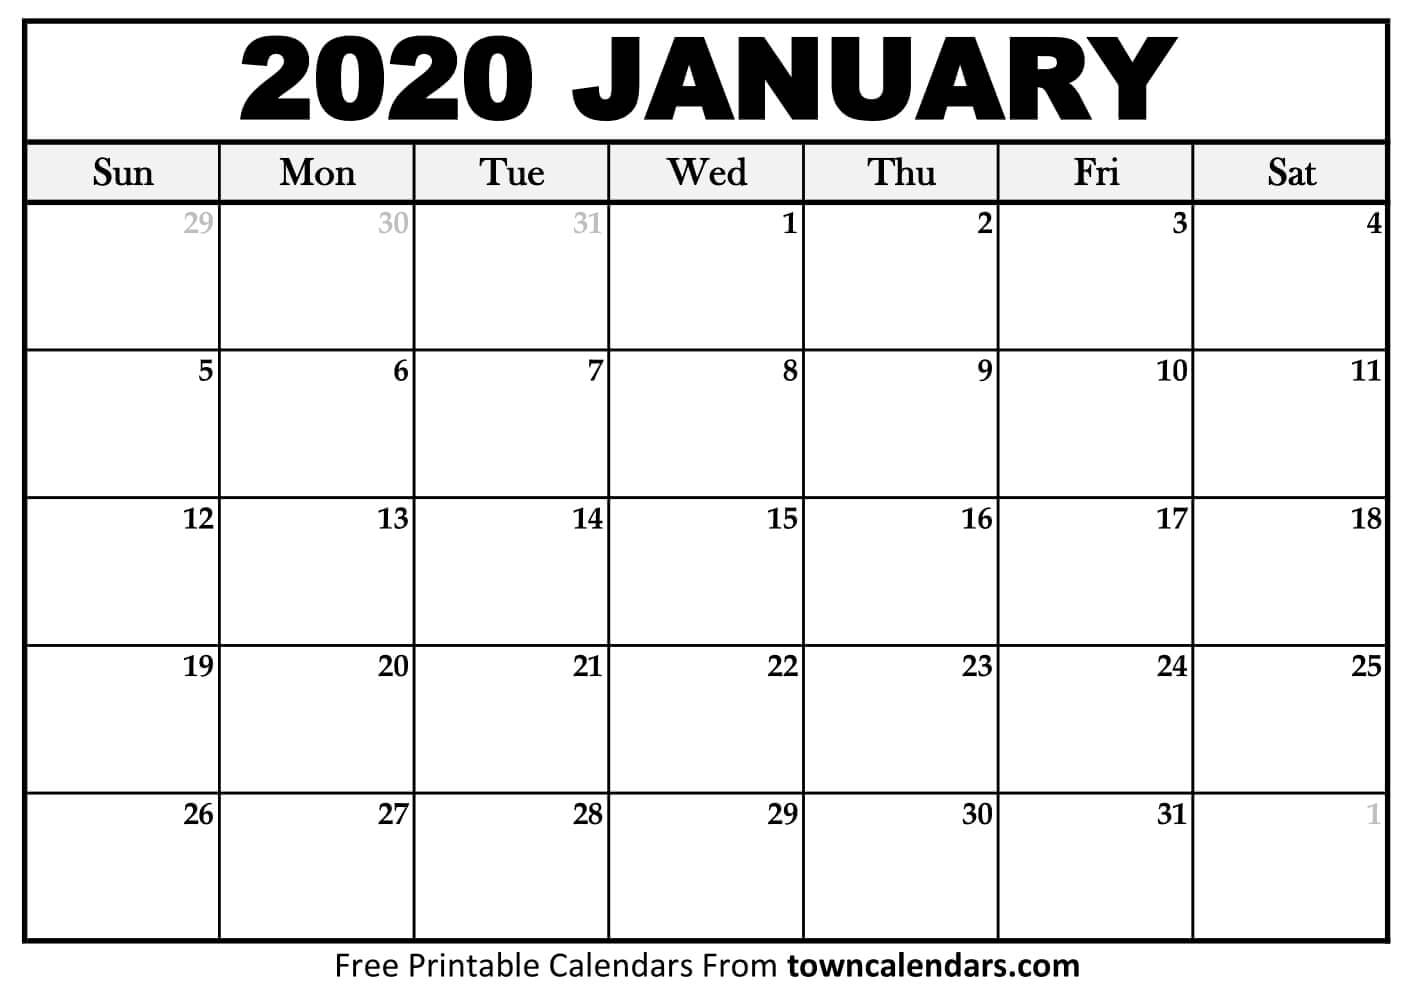 Printable January 2020 Calendar  Towncalendars with Jan 2020 Calendar